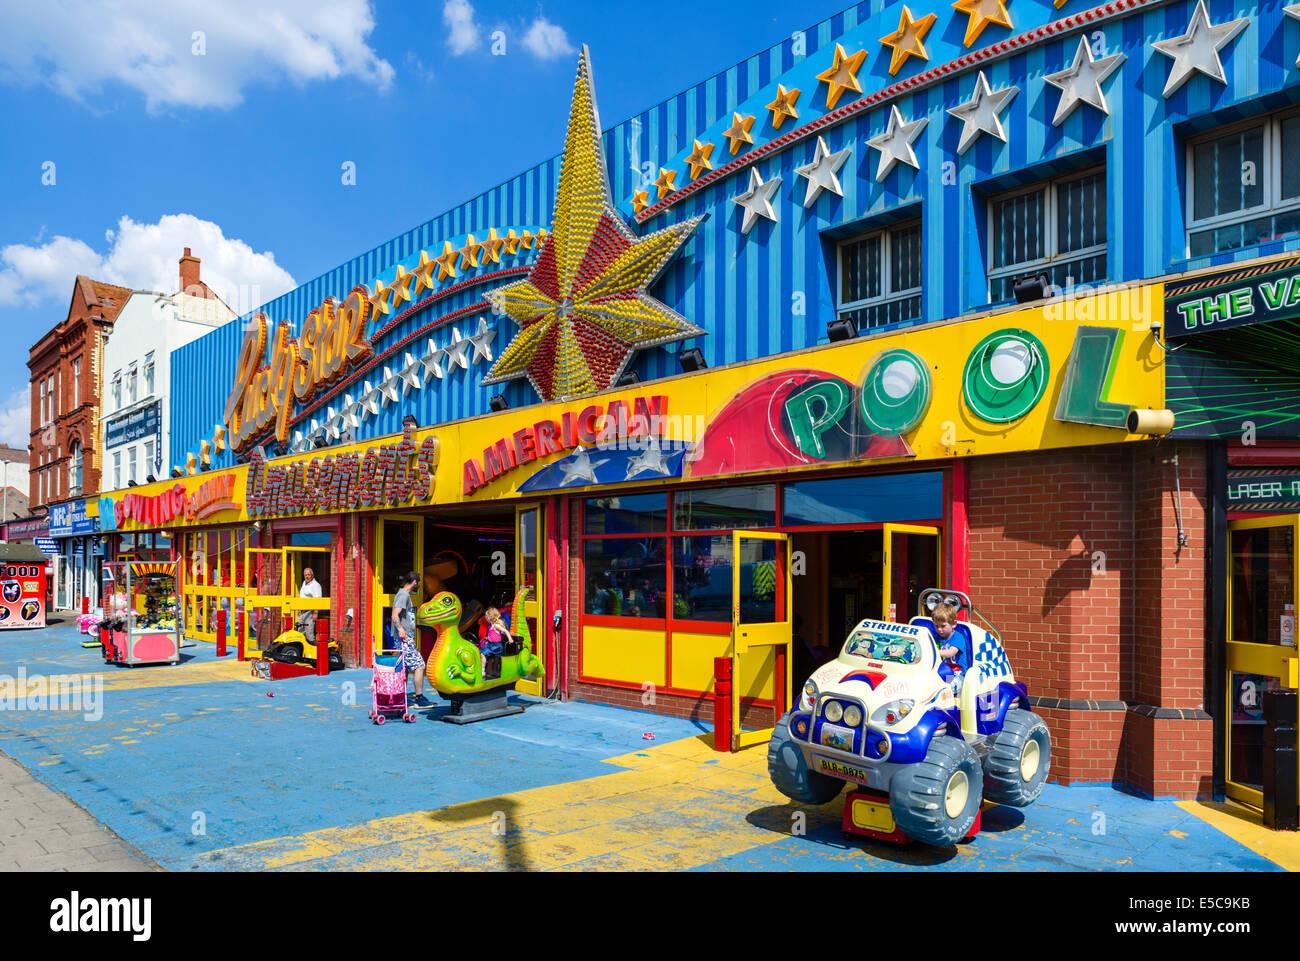 Amusement arcade on the promenade by South Pier, Blackpool, Lancashire, UK - Stock Image